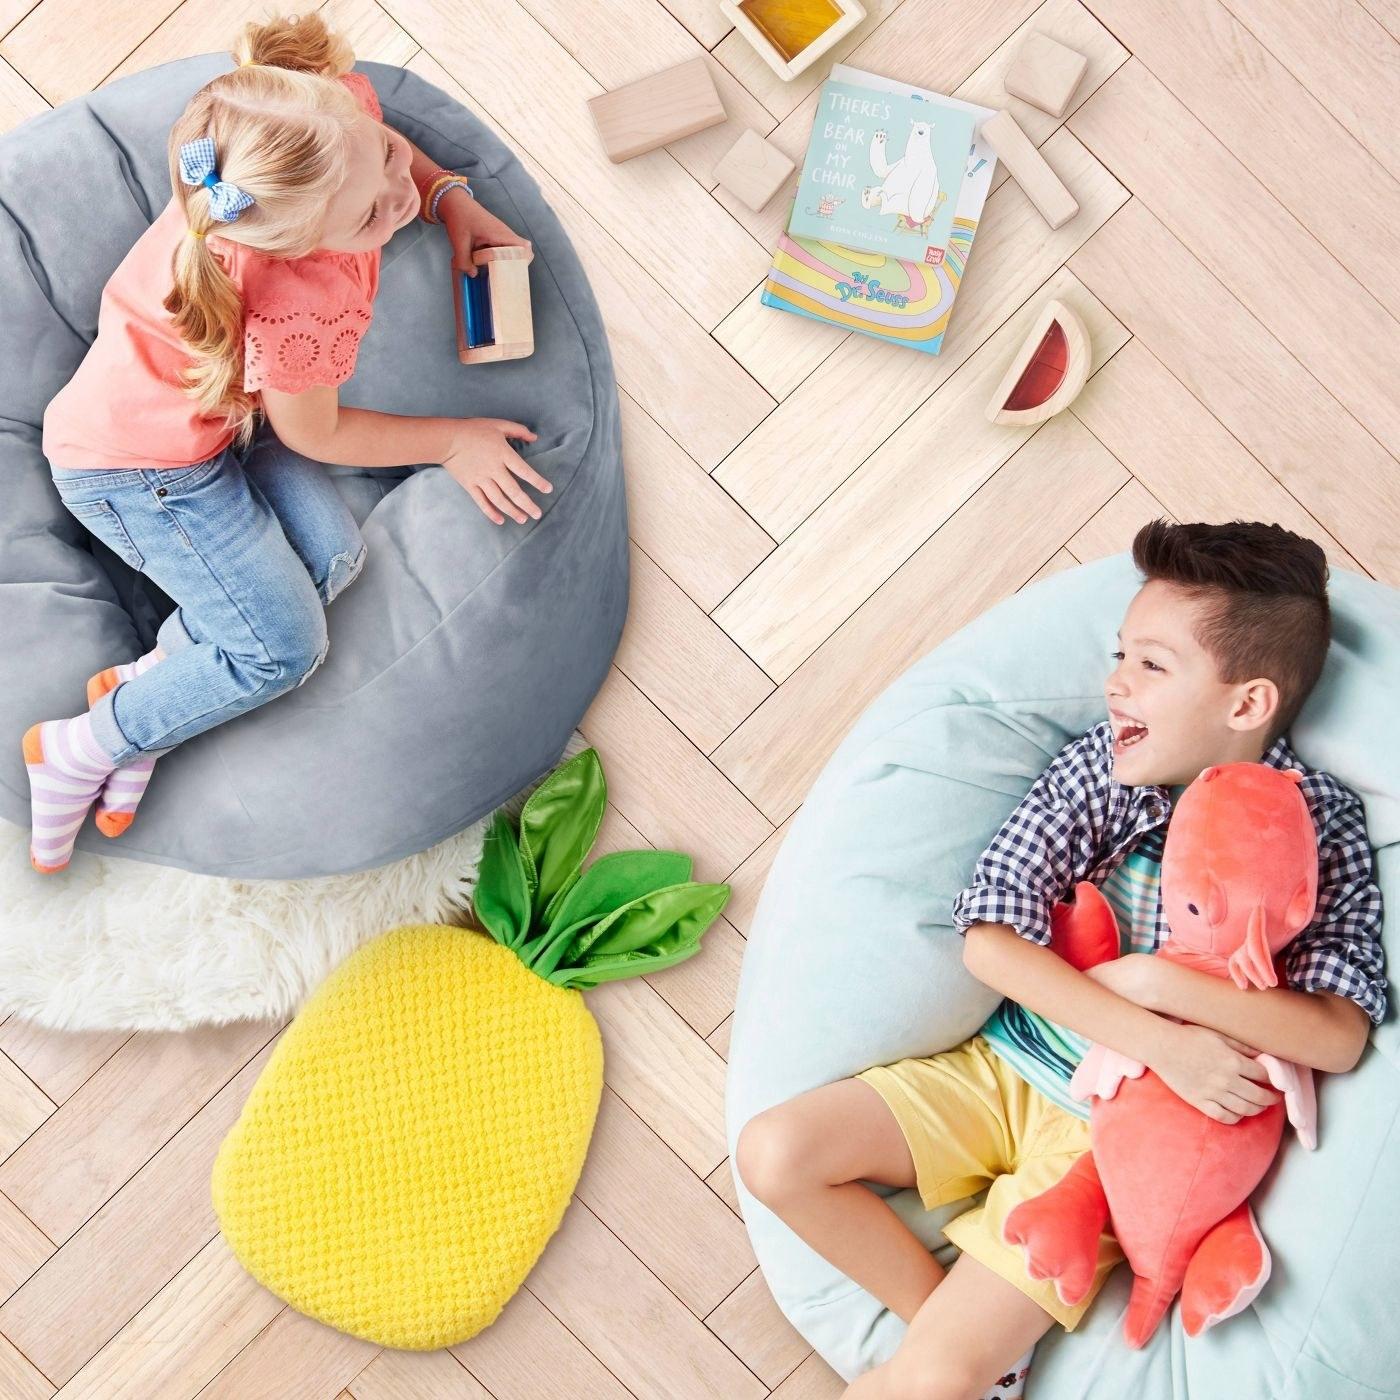 two children cuddling soft stuffed animals